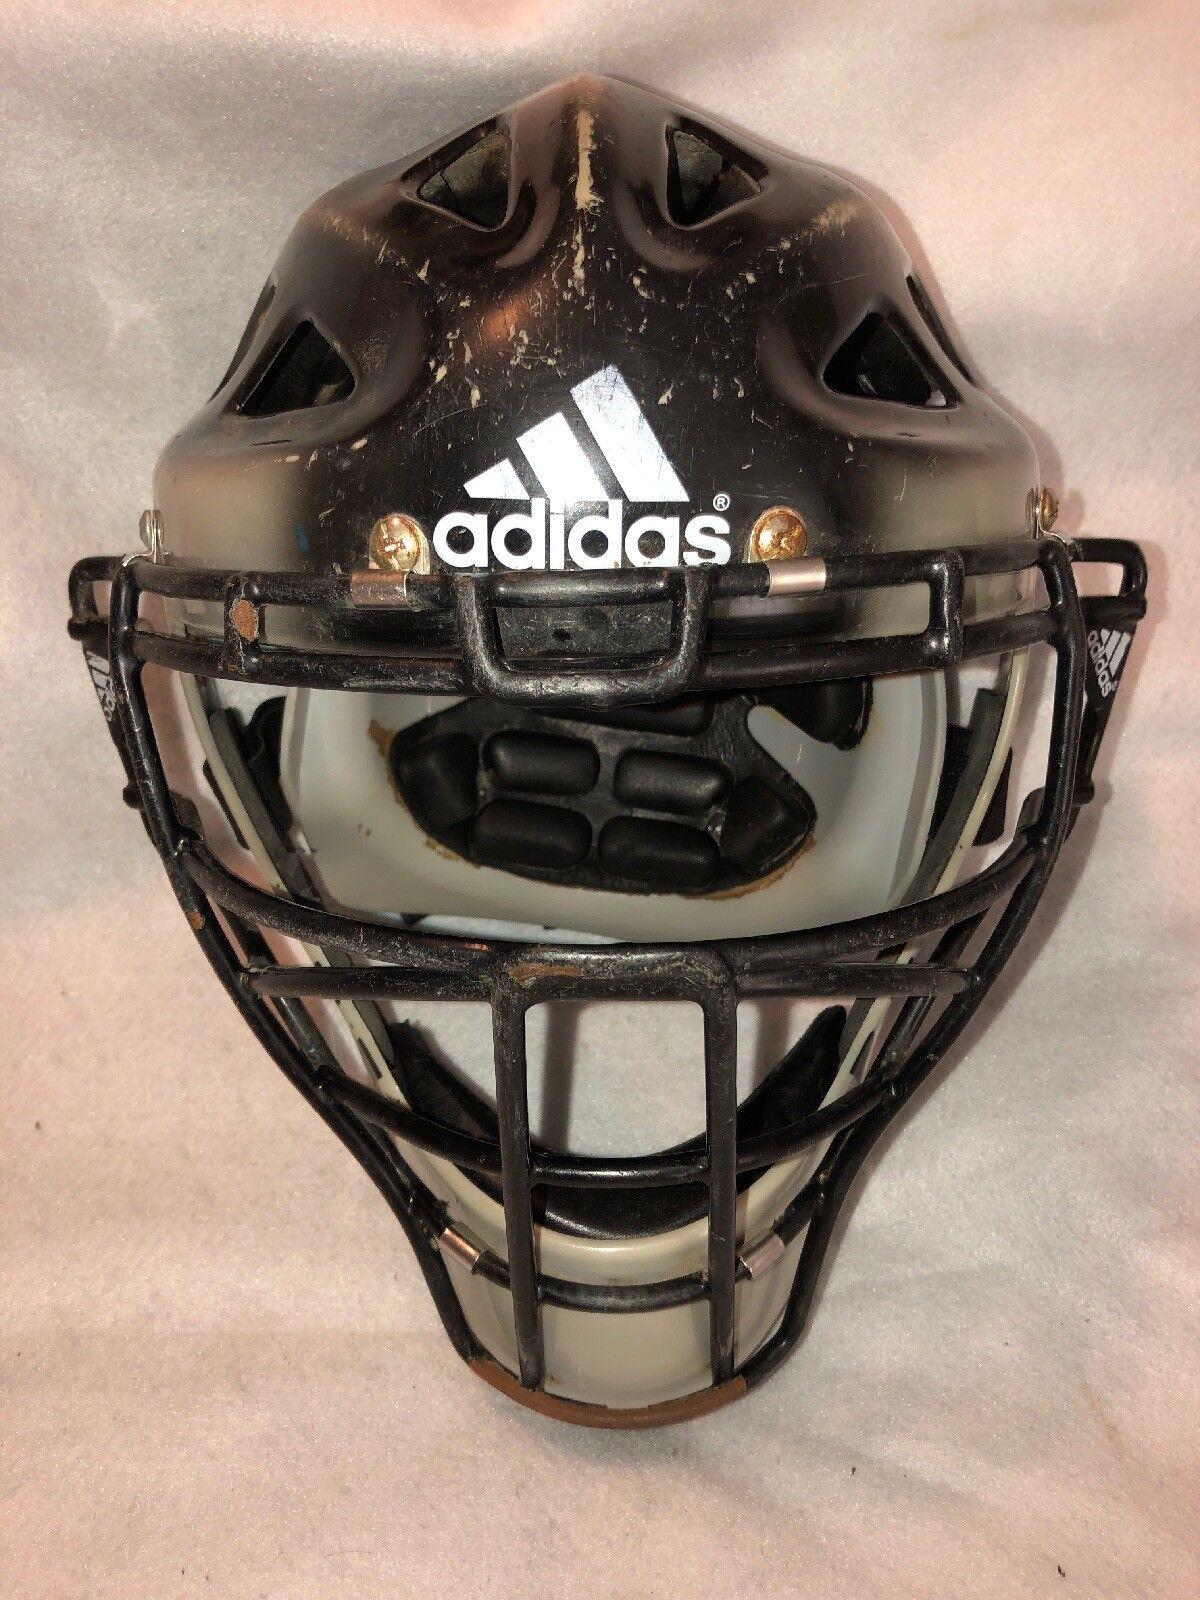 ADIDAS Phenom Catchers Helmet Mask Size 7 - 7 3 4 ItemBTE00041 Nice Free Ship